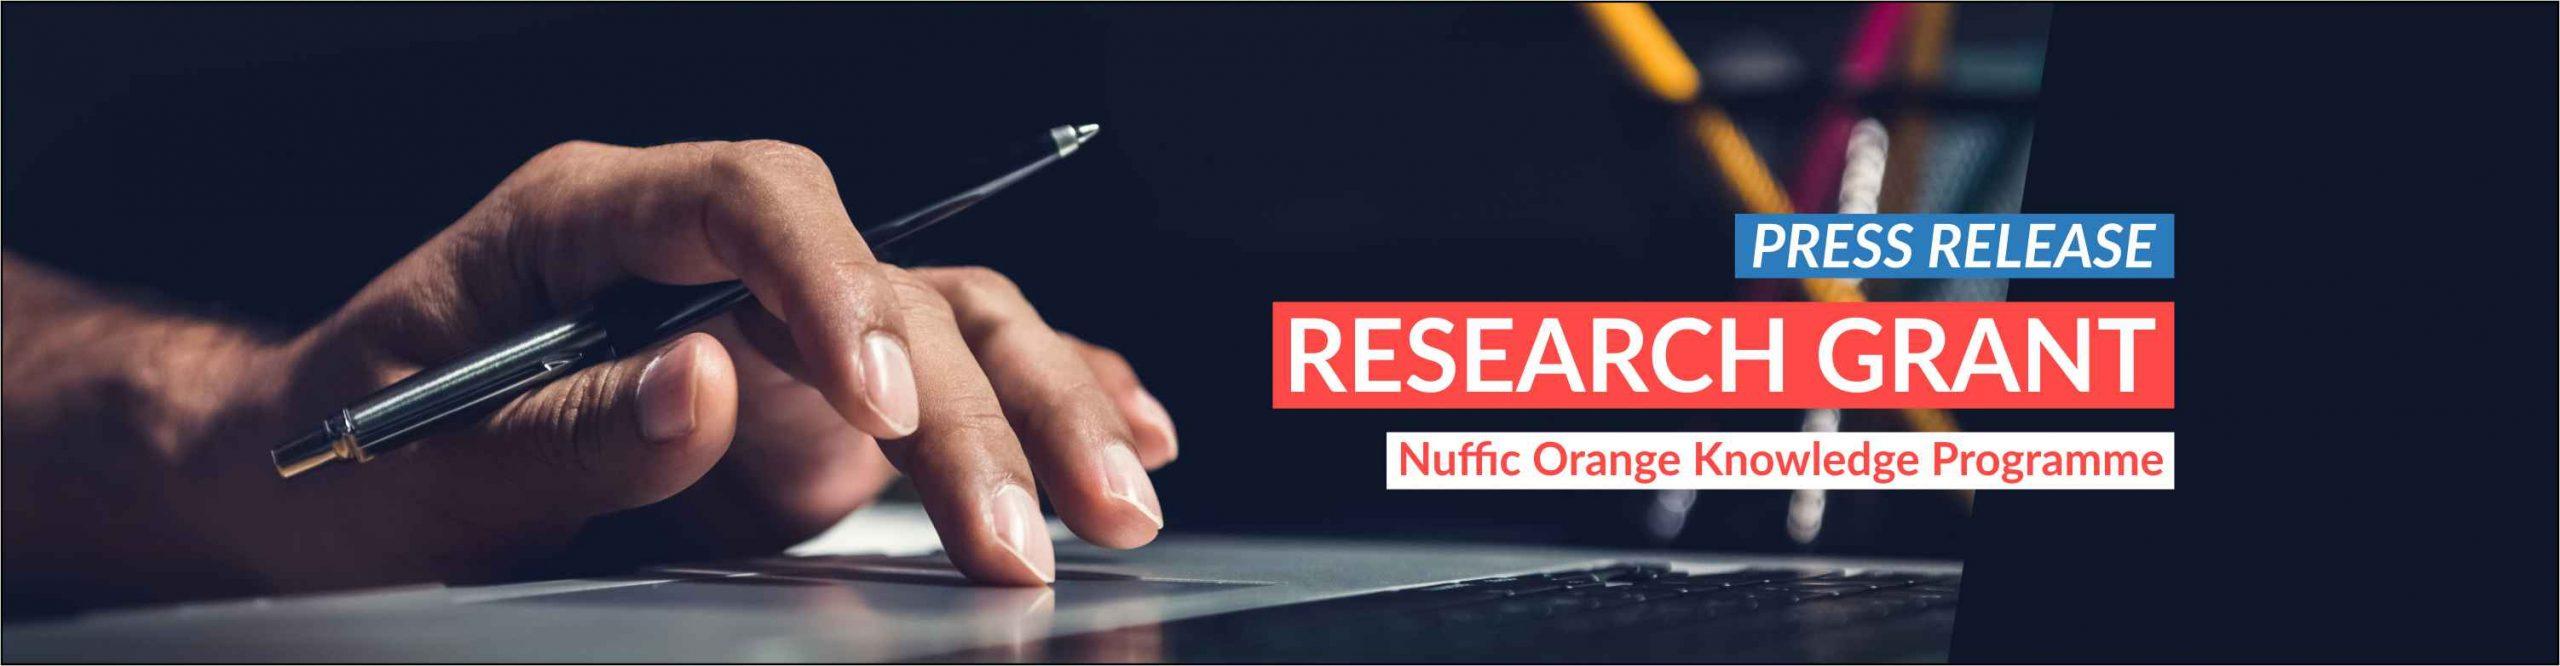 [SIARAN PERS] Proyek Kolaborasi Center for Digital Society dengan Universitas Groningen | Nuffic Orange Knowledge Programme Research Grant